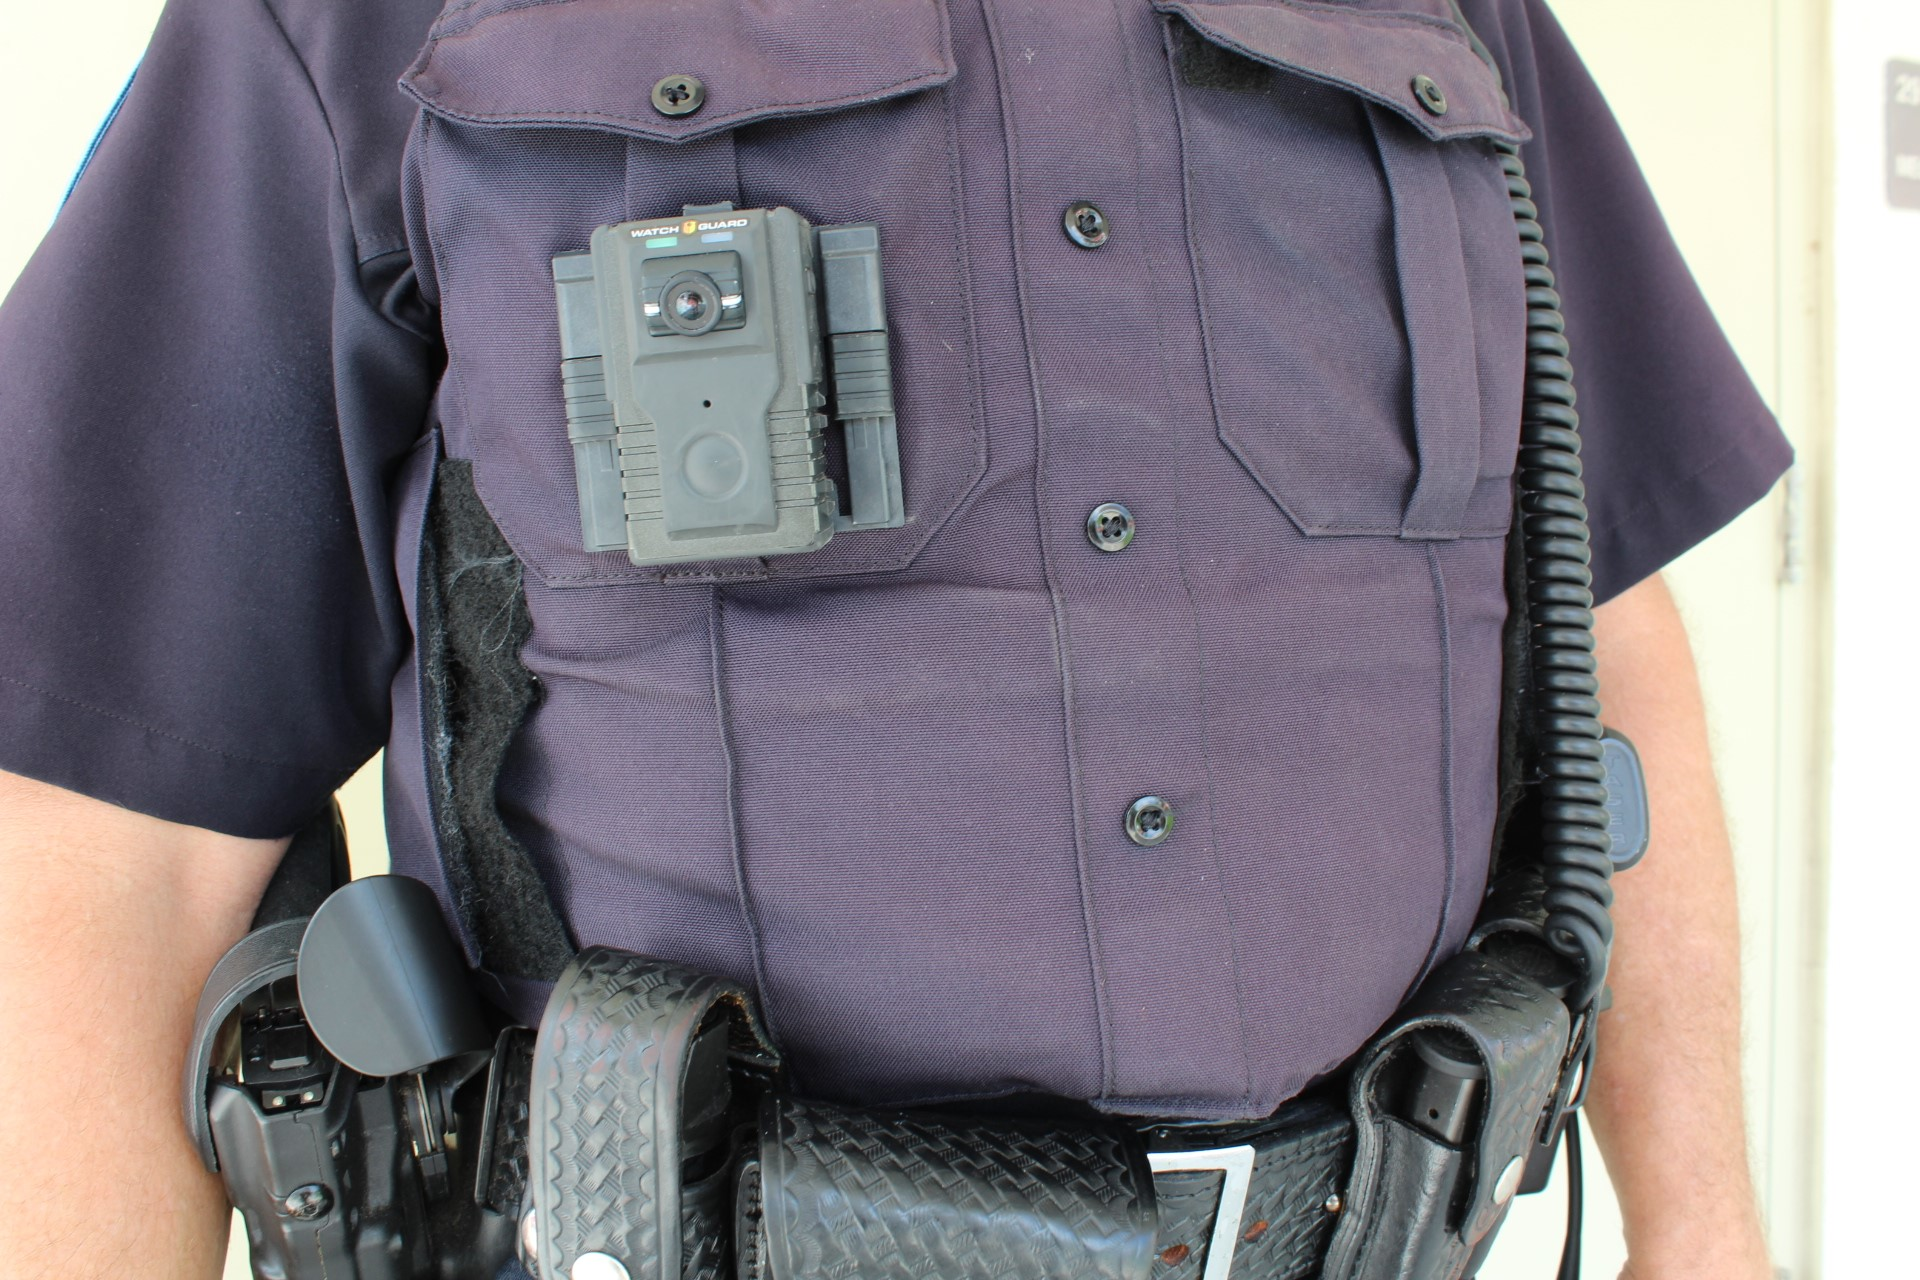 Body camera on a police officer